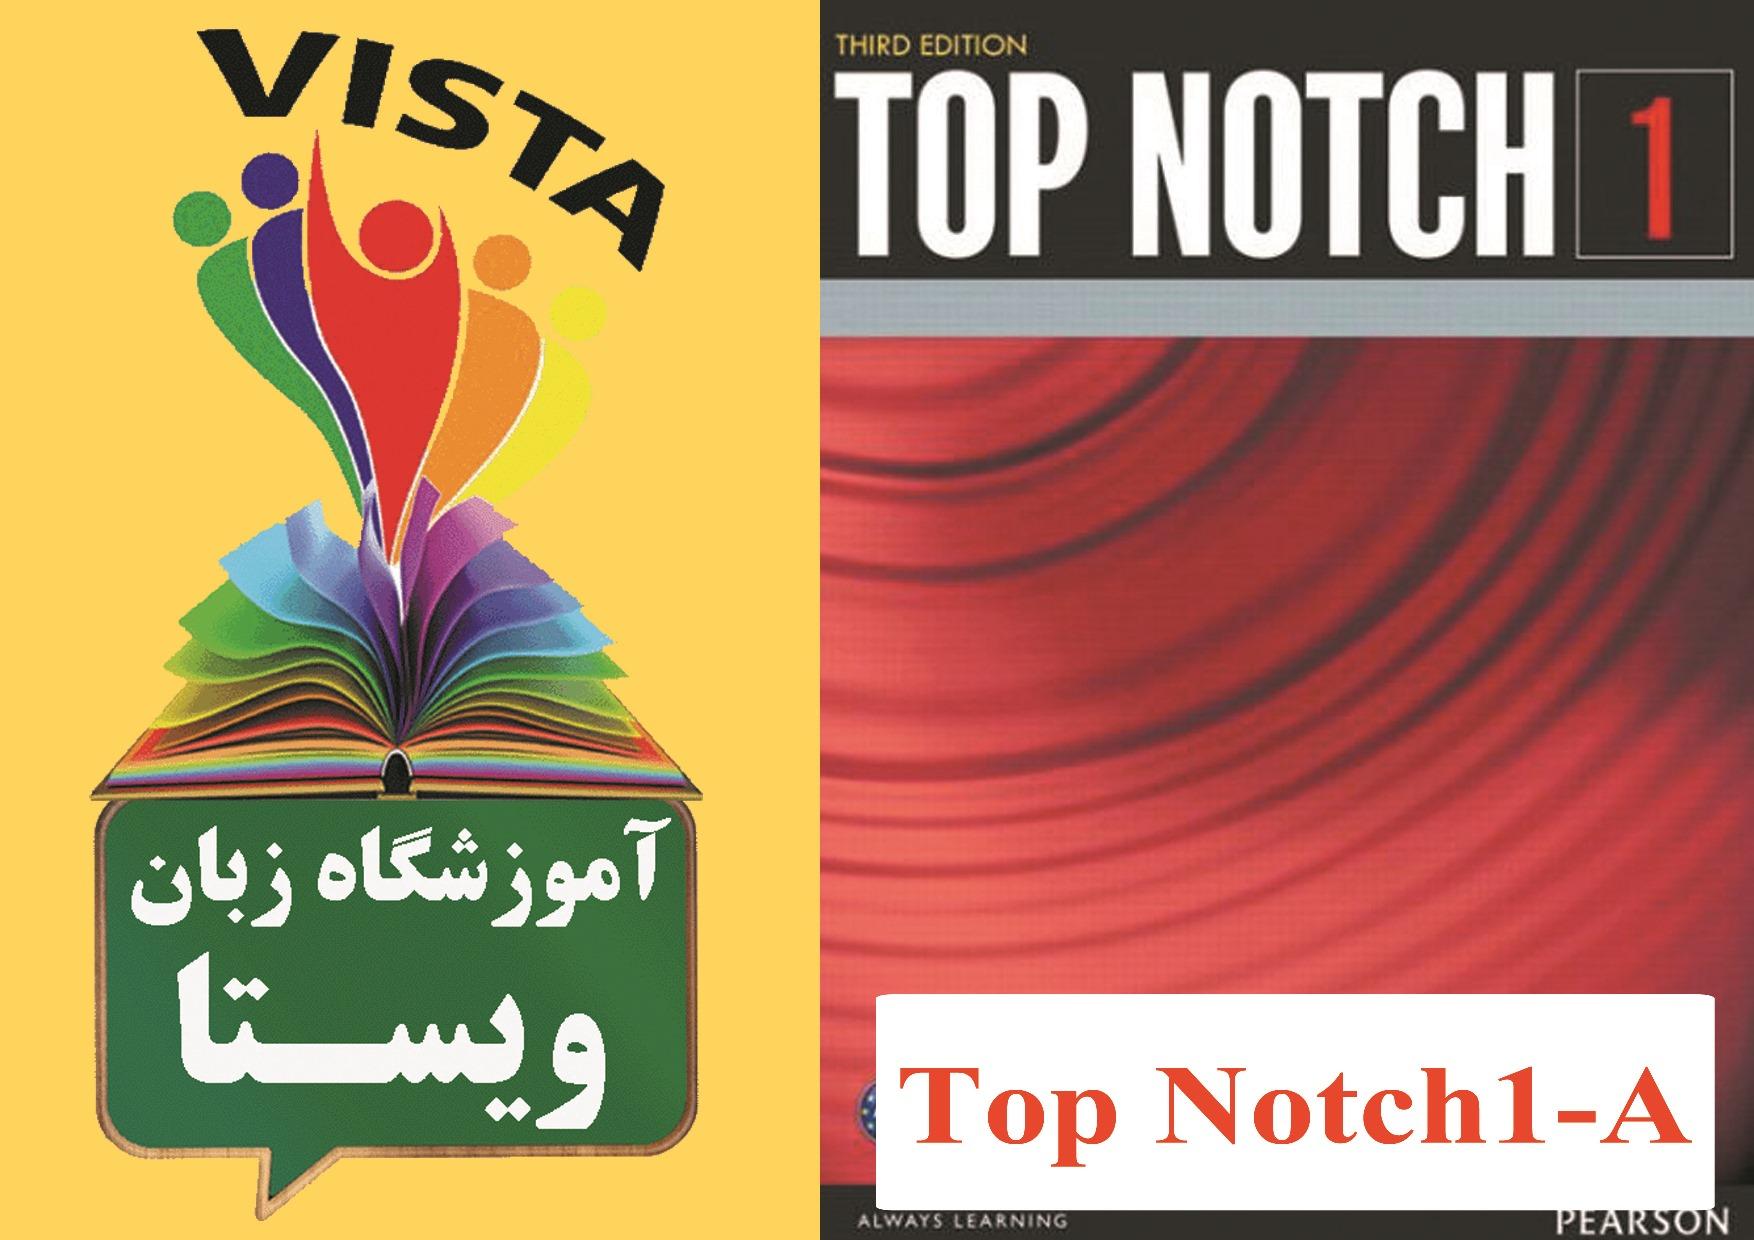 دوره Top Notch1A آموزشگاه زبان ویستا